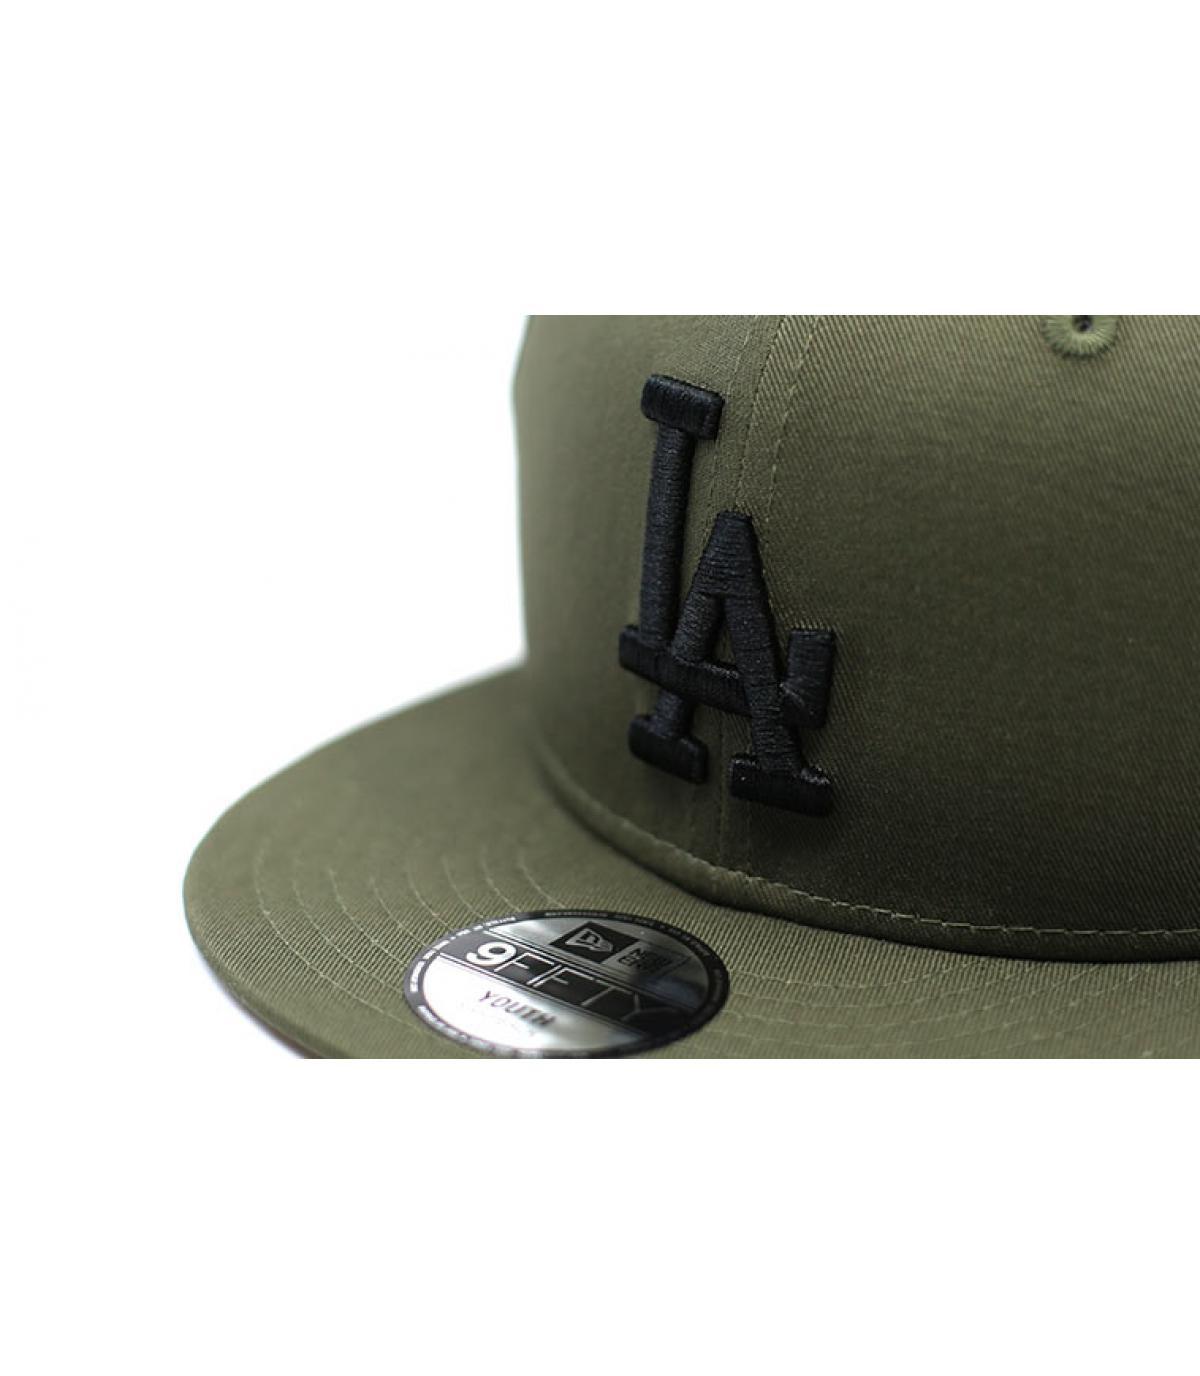 Details League Ess LA 9Fifty black olive black - afbeeling 3